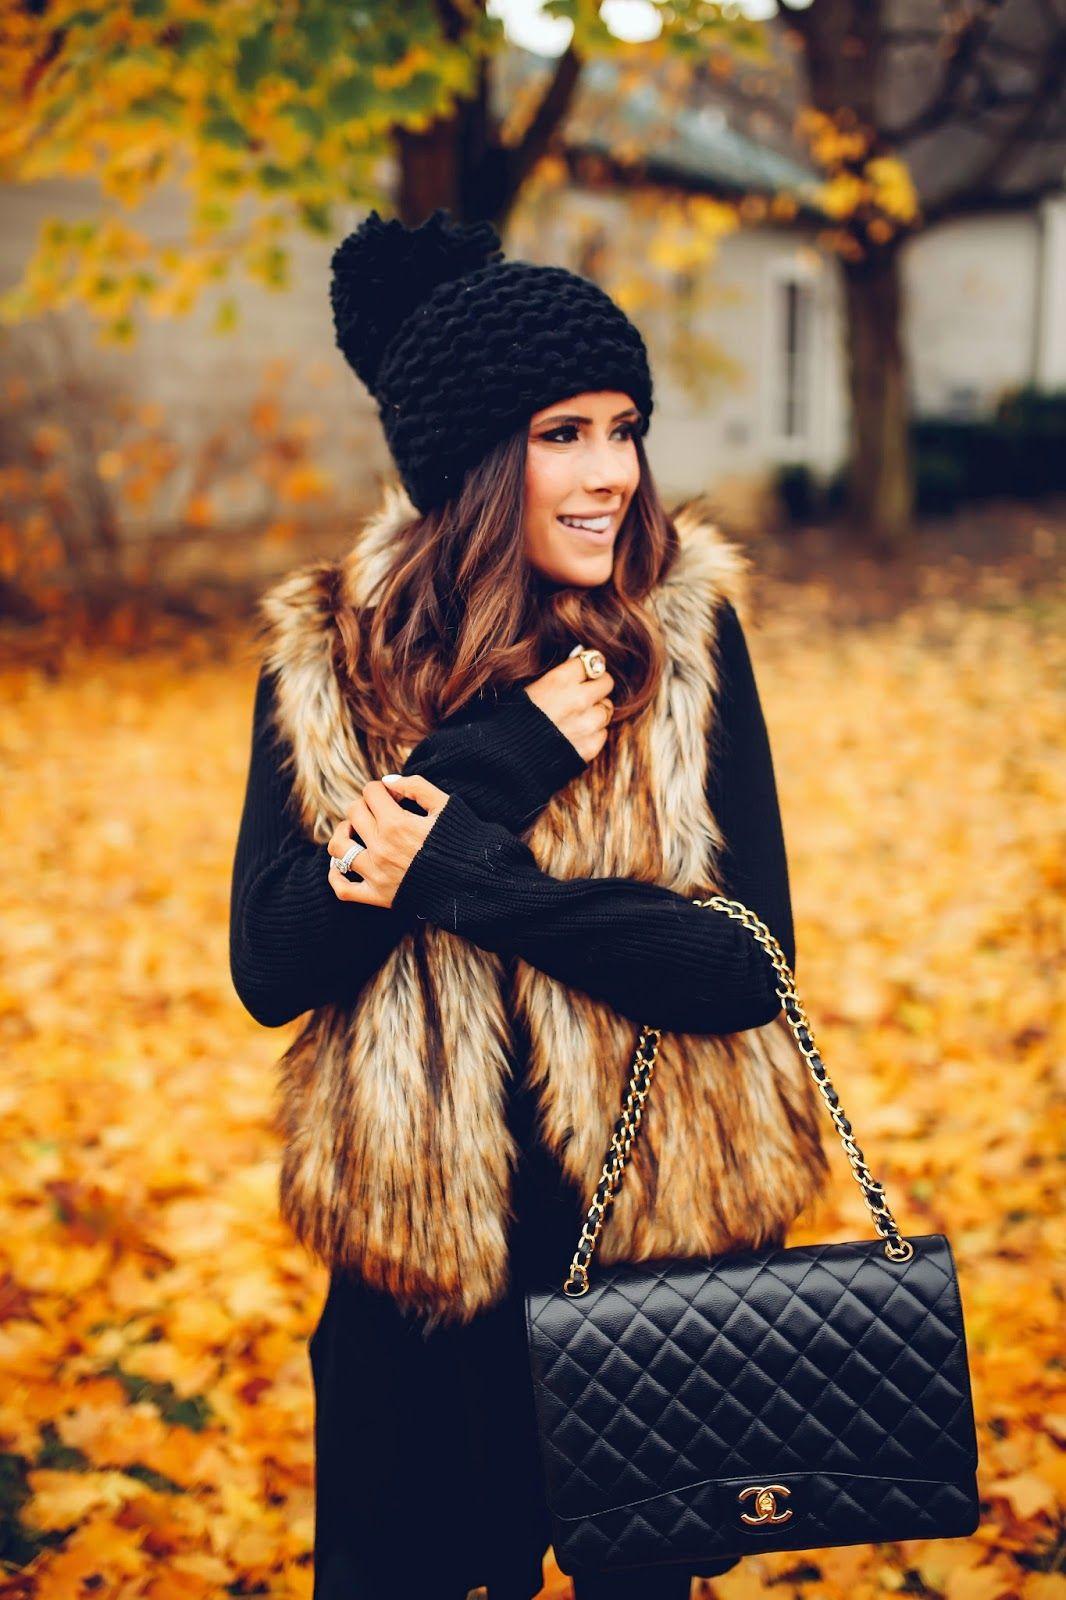 fb4c011831cc Black sweater dress, fur vest.. love all of the outfits on this girls blog  @emilyanngemma